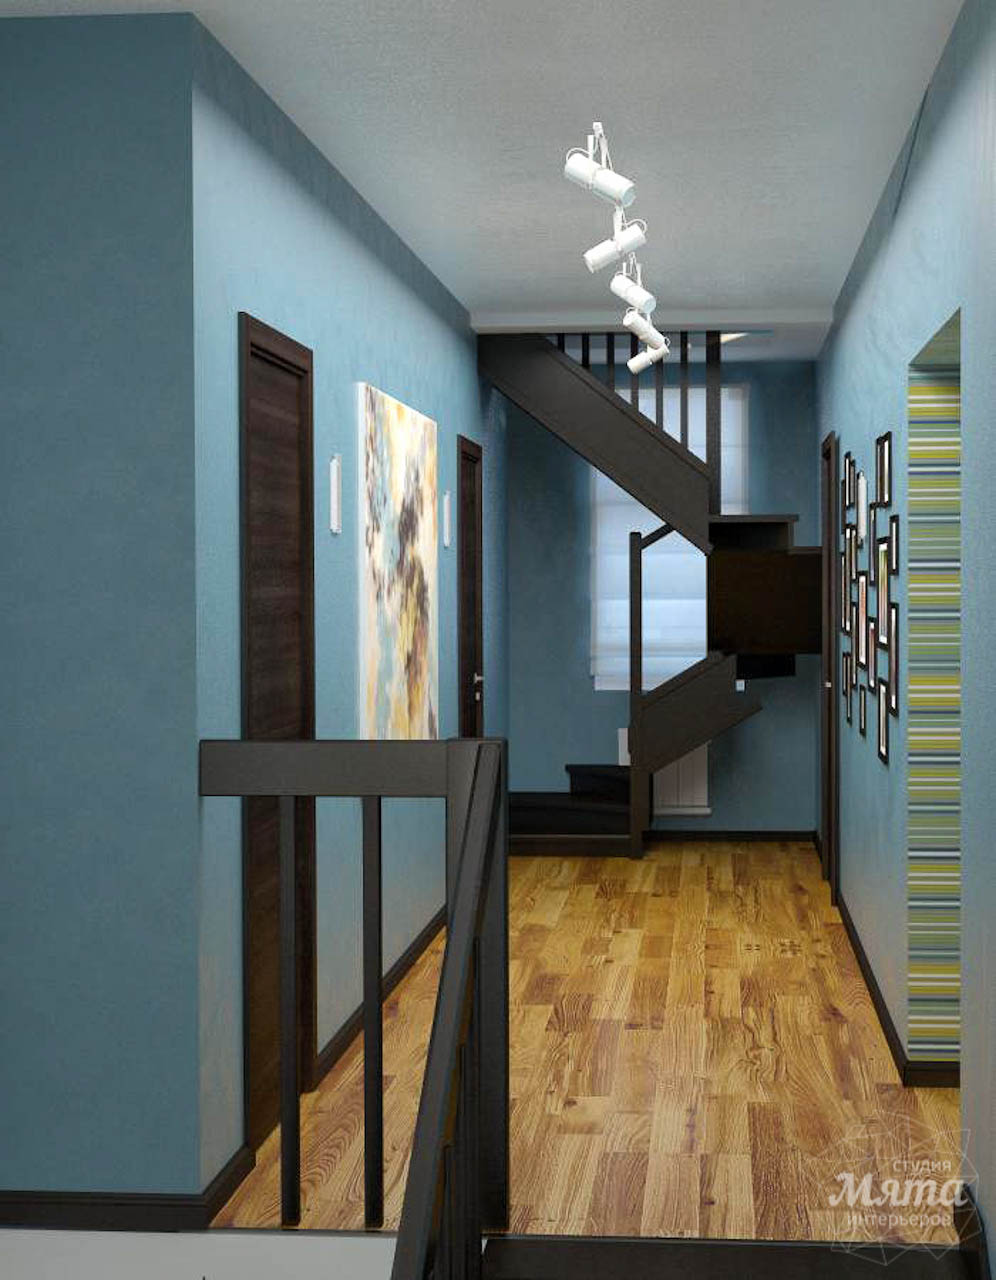 Дизайн проект интерьера коттеджа  в стиле минимализм по ул. Барвинка 15 img2134639977